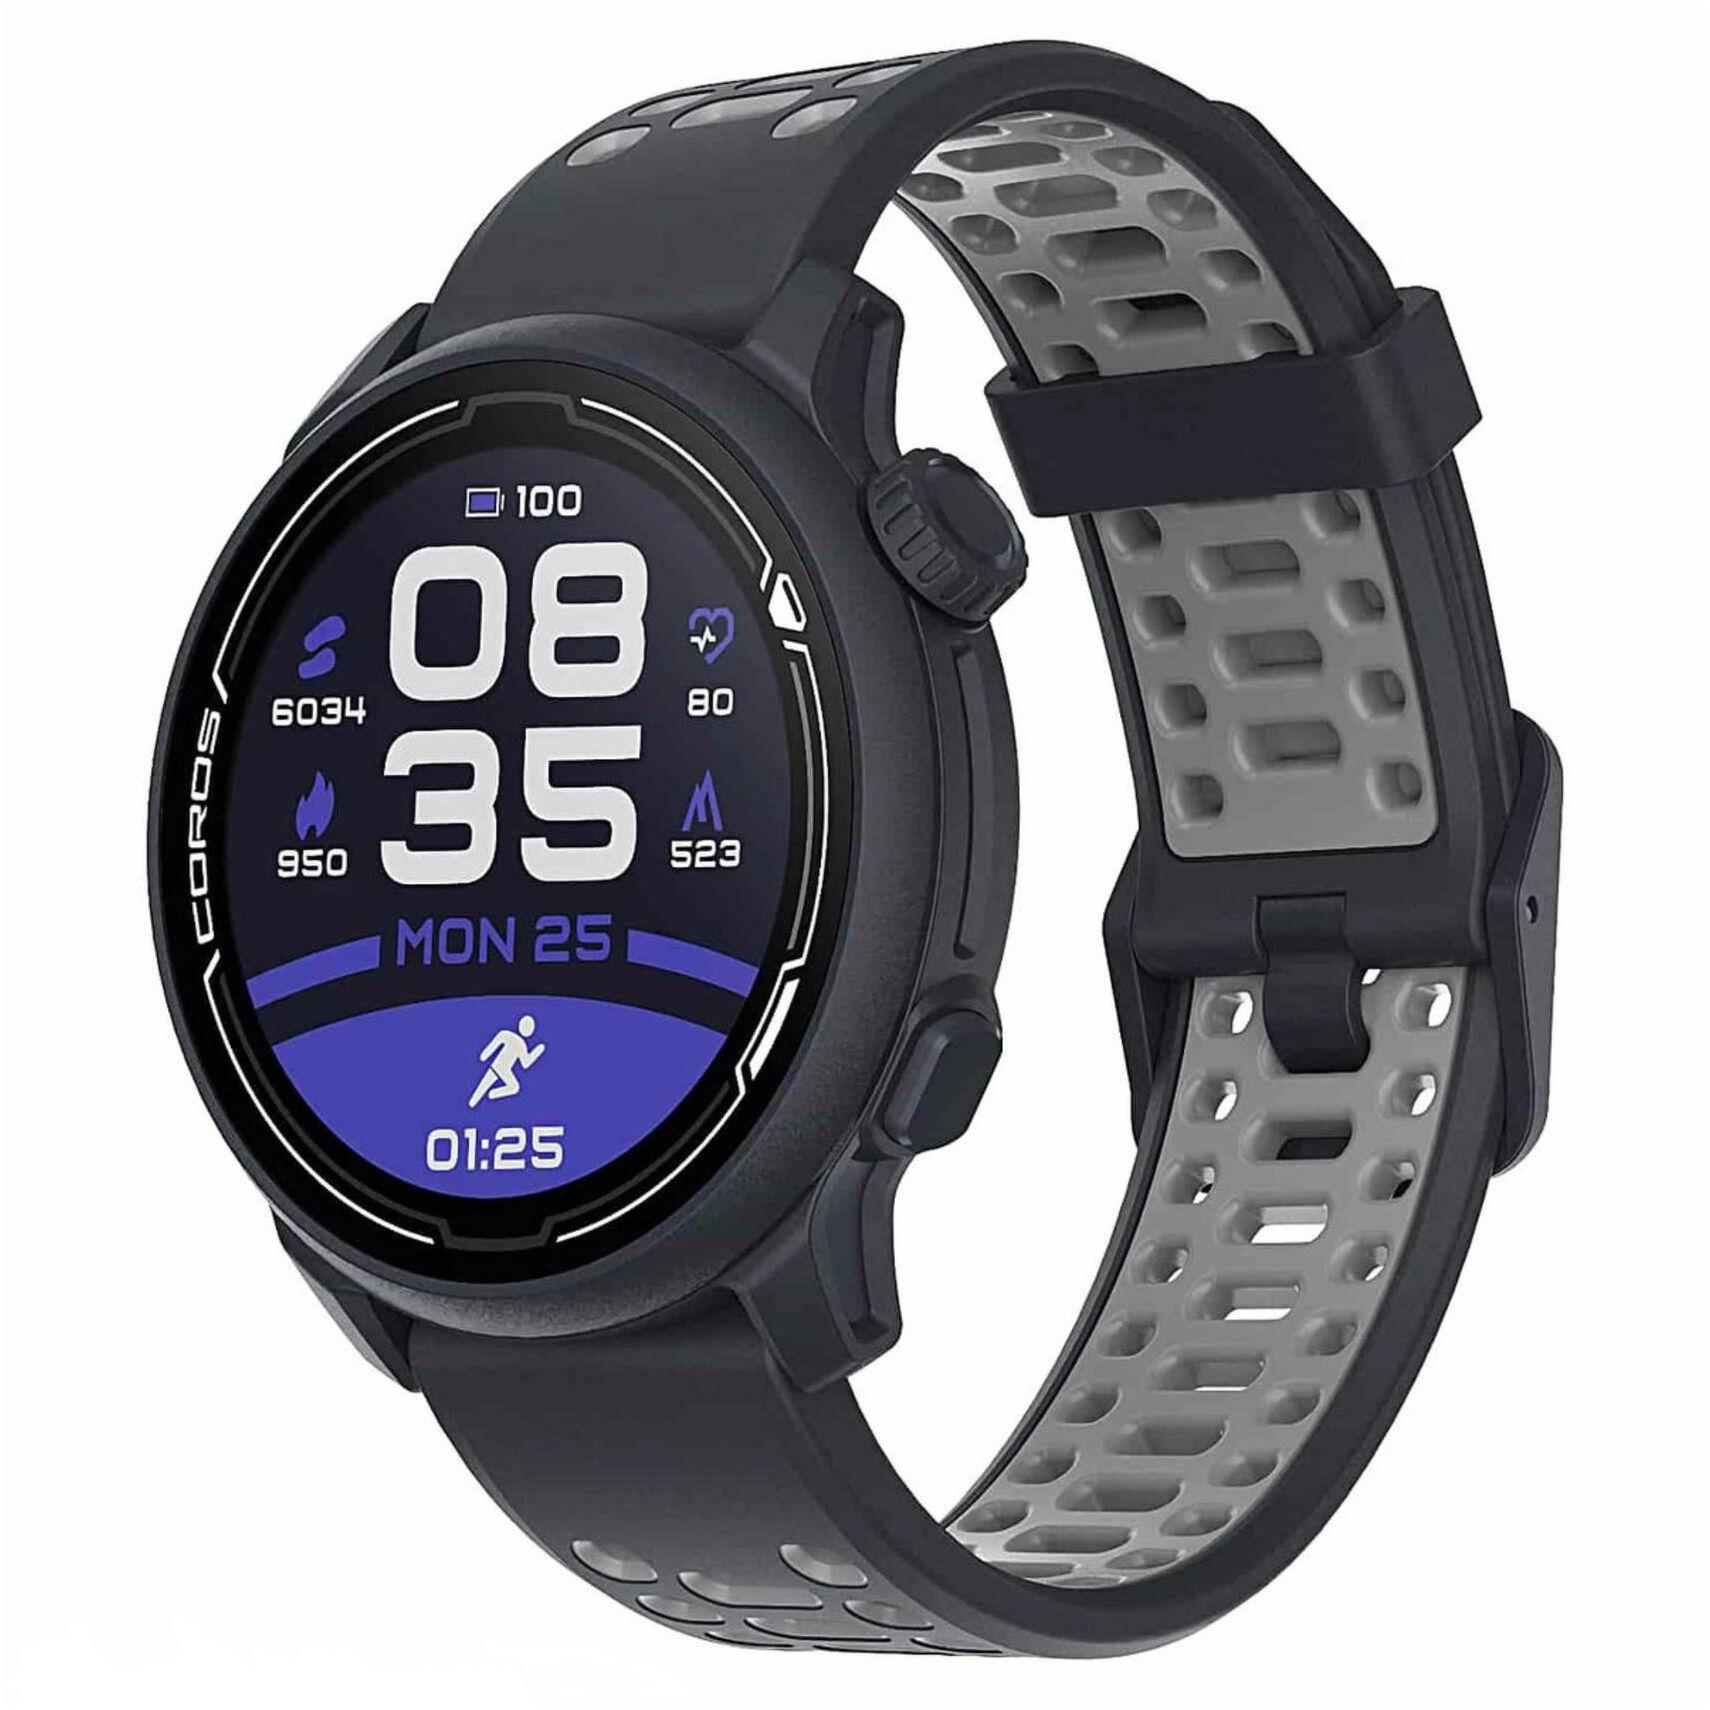 Zegarek do biegania z gps Coros Pace 2 Dark Navy